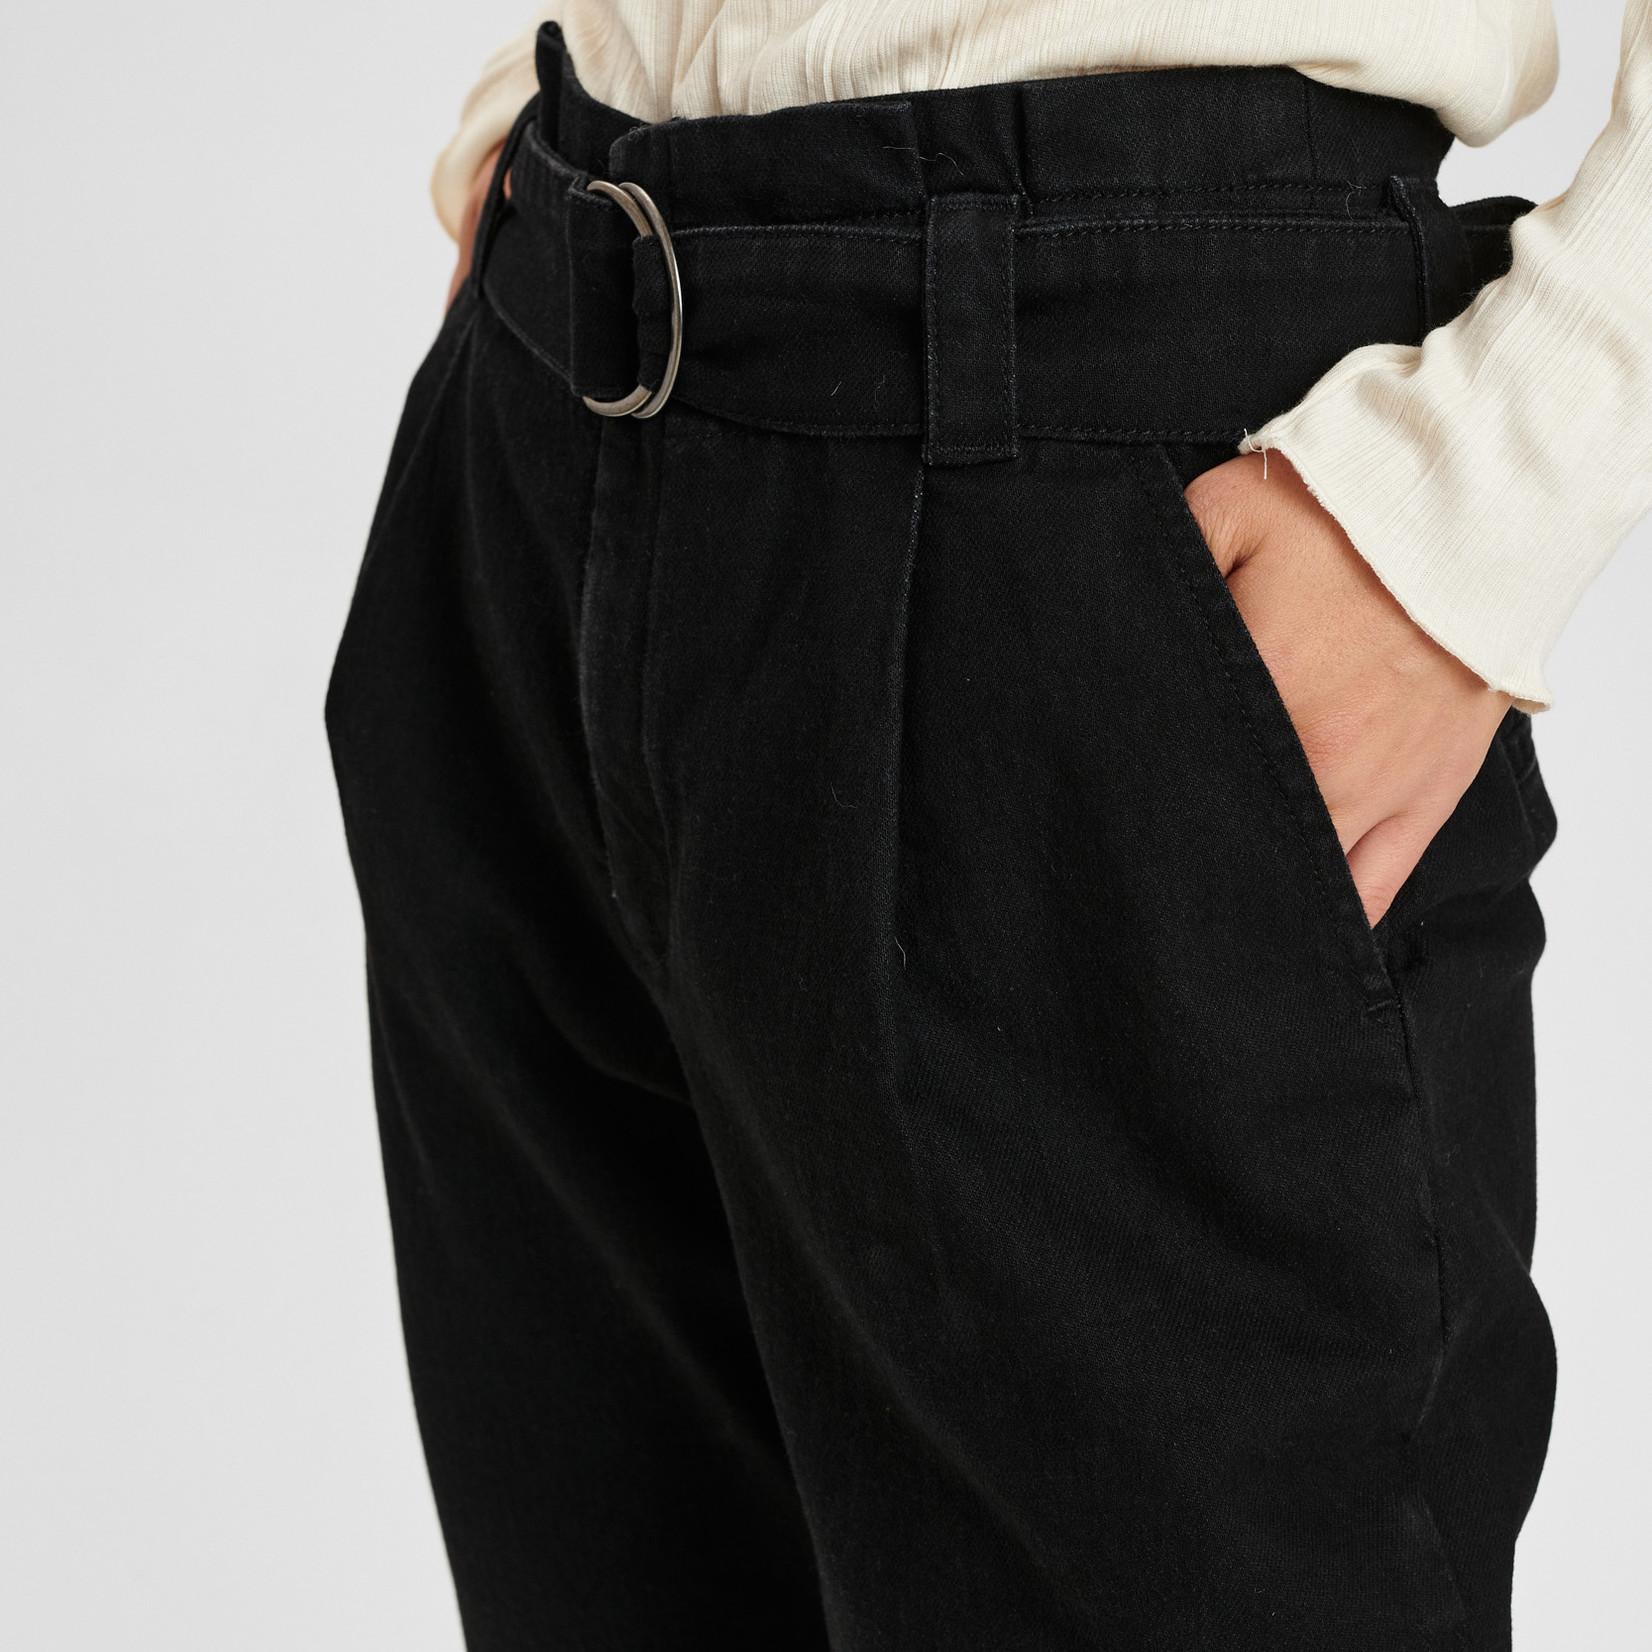 NÜMPH NUEVA JEANS, mom jeans